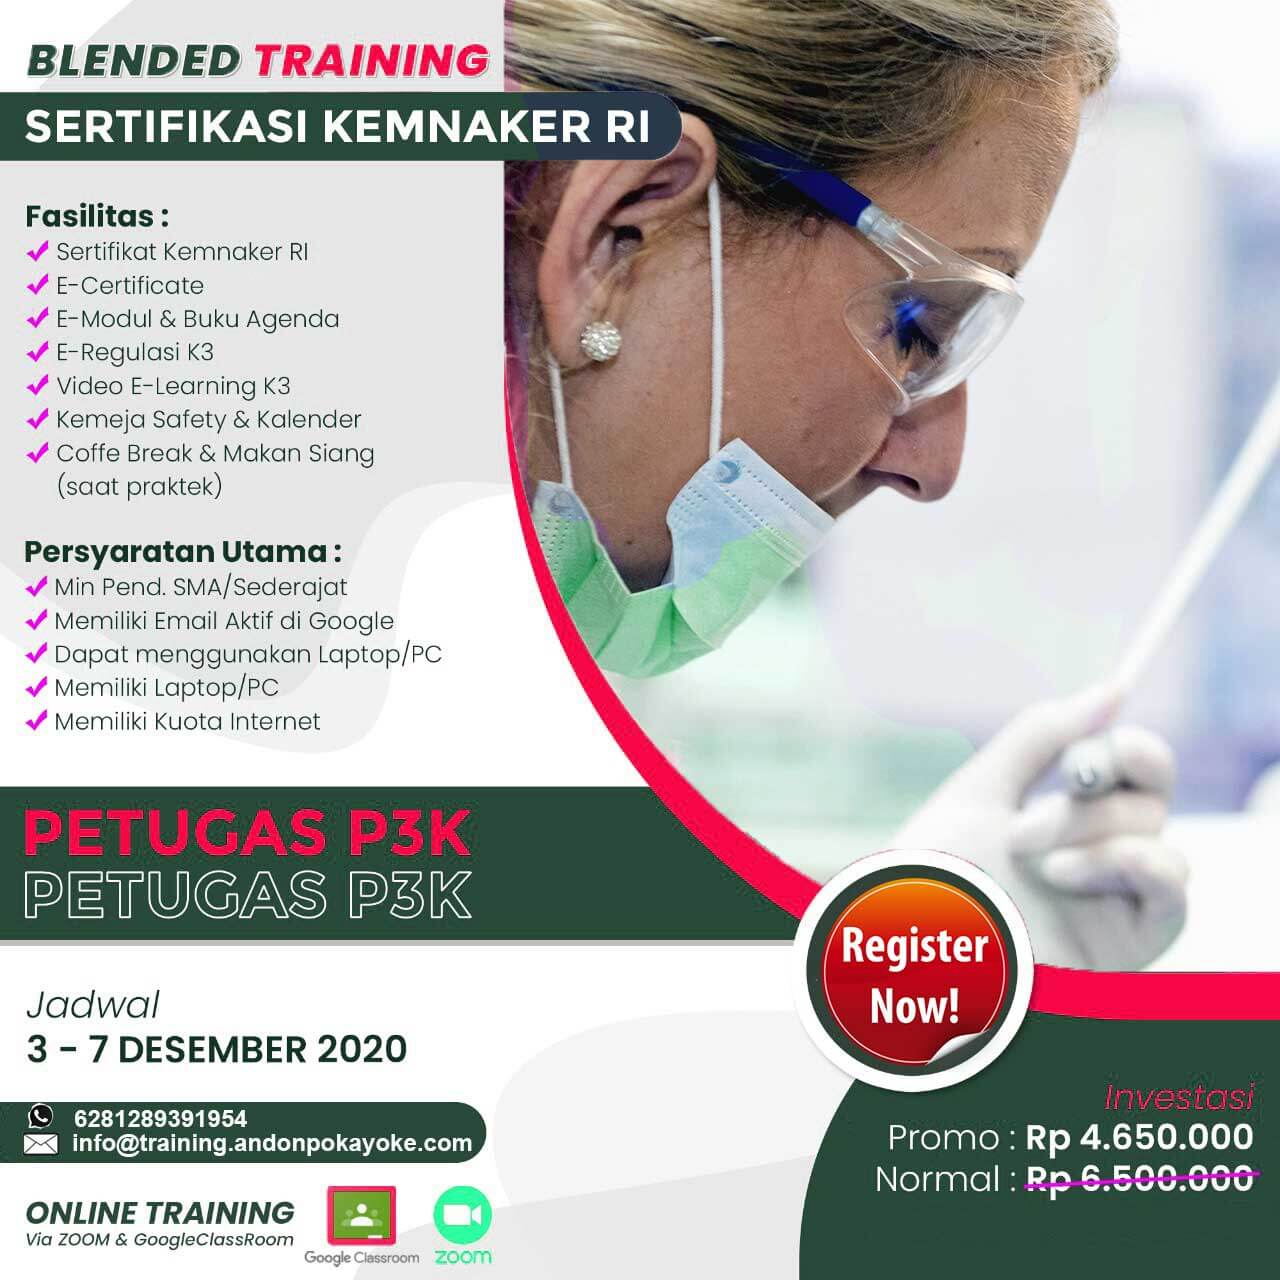 Blended Training Petugas P3K Kemnaker